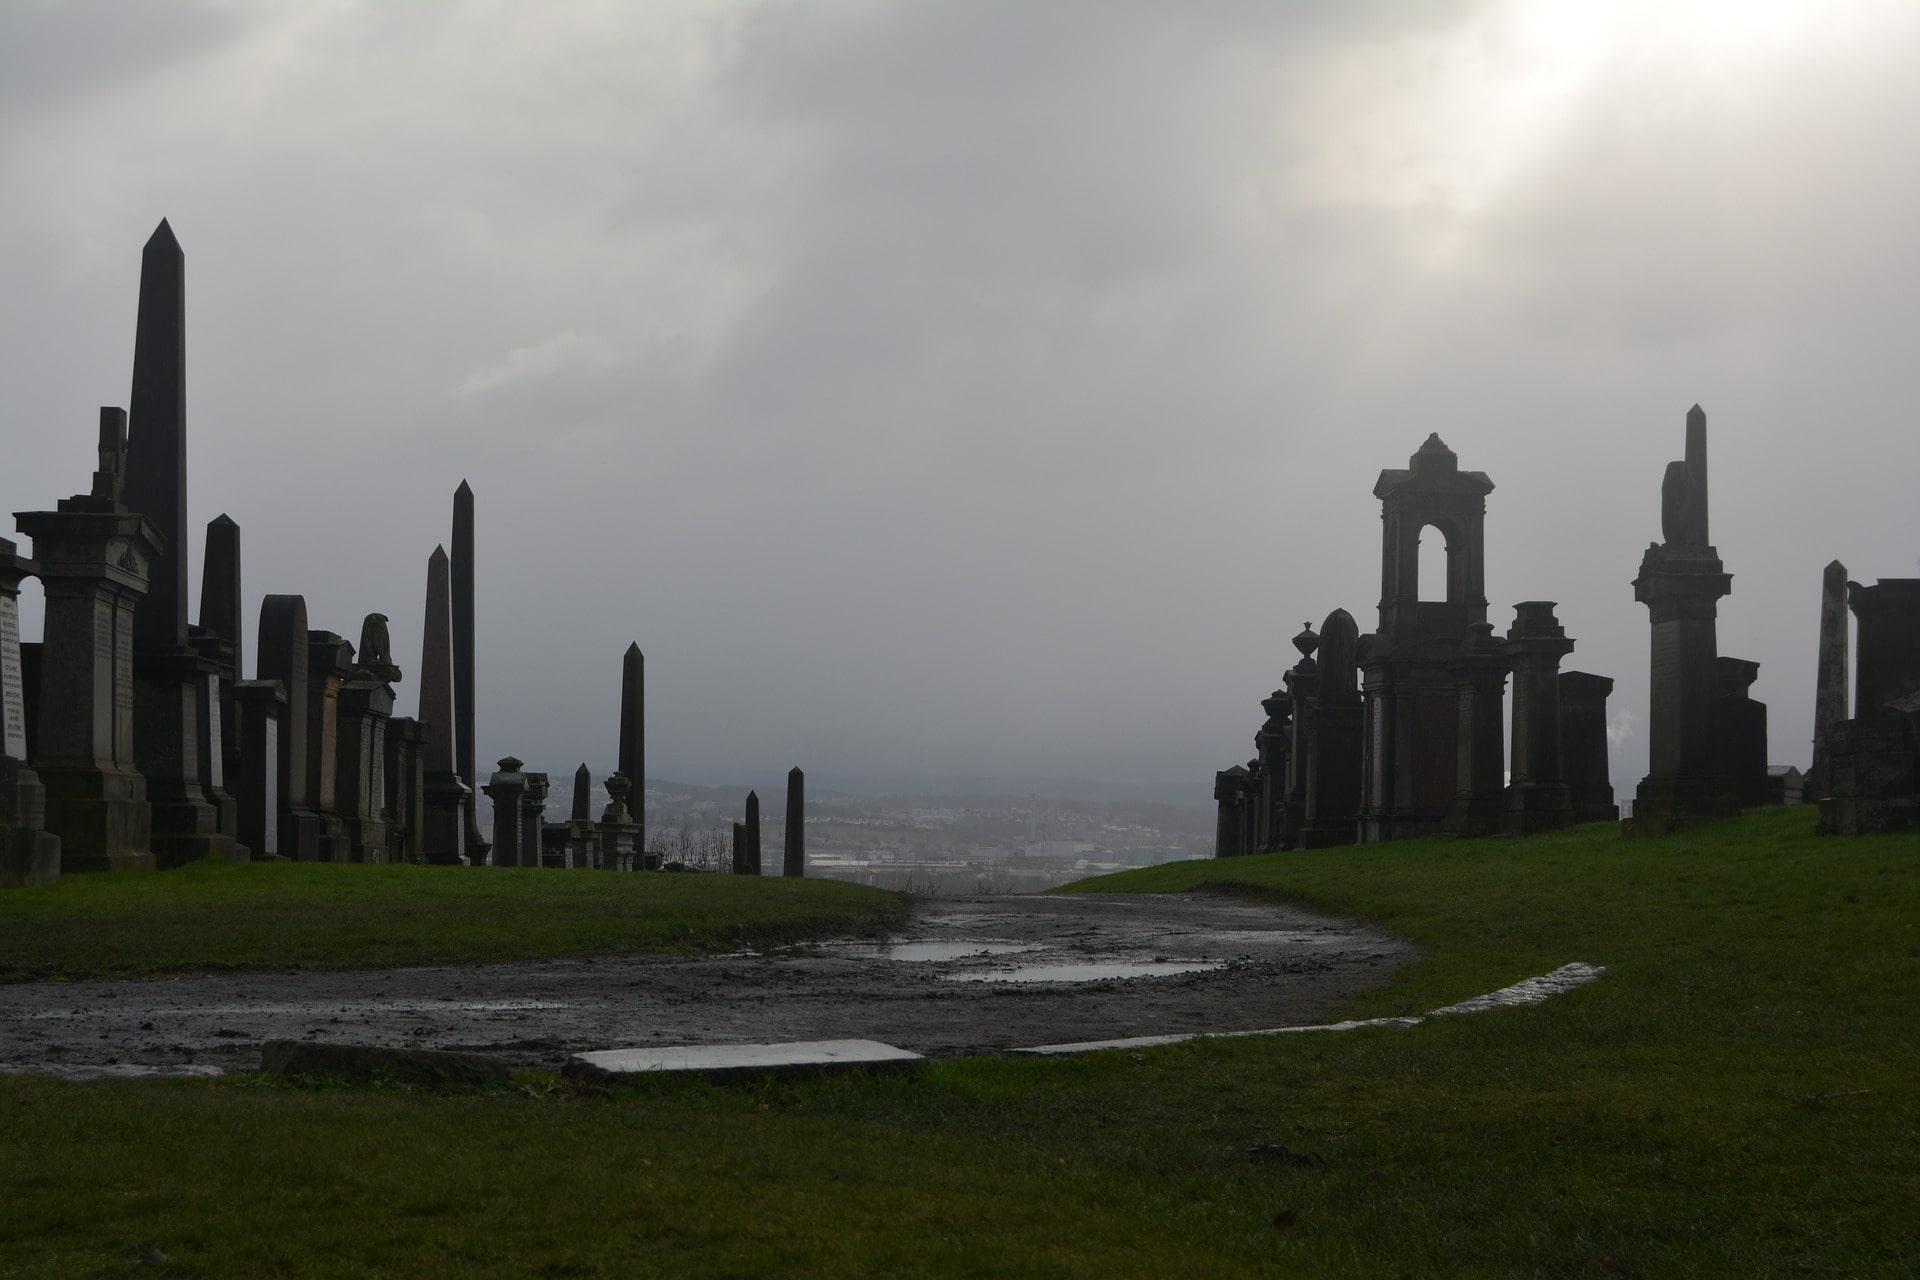 a-creepy-graveyard-on-a-dreary-winters-day-glasgow-necropolis